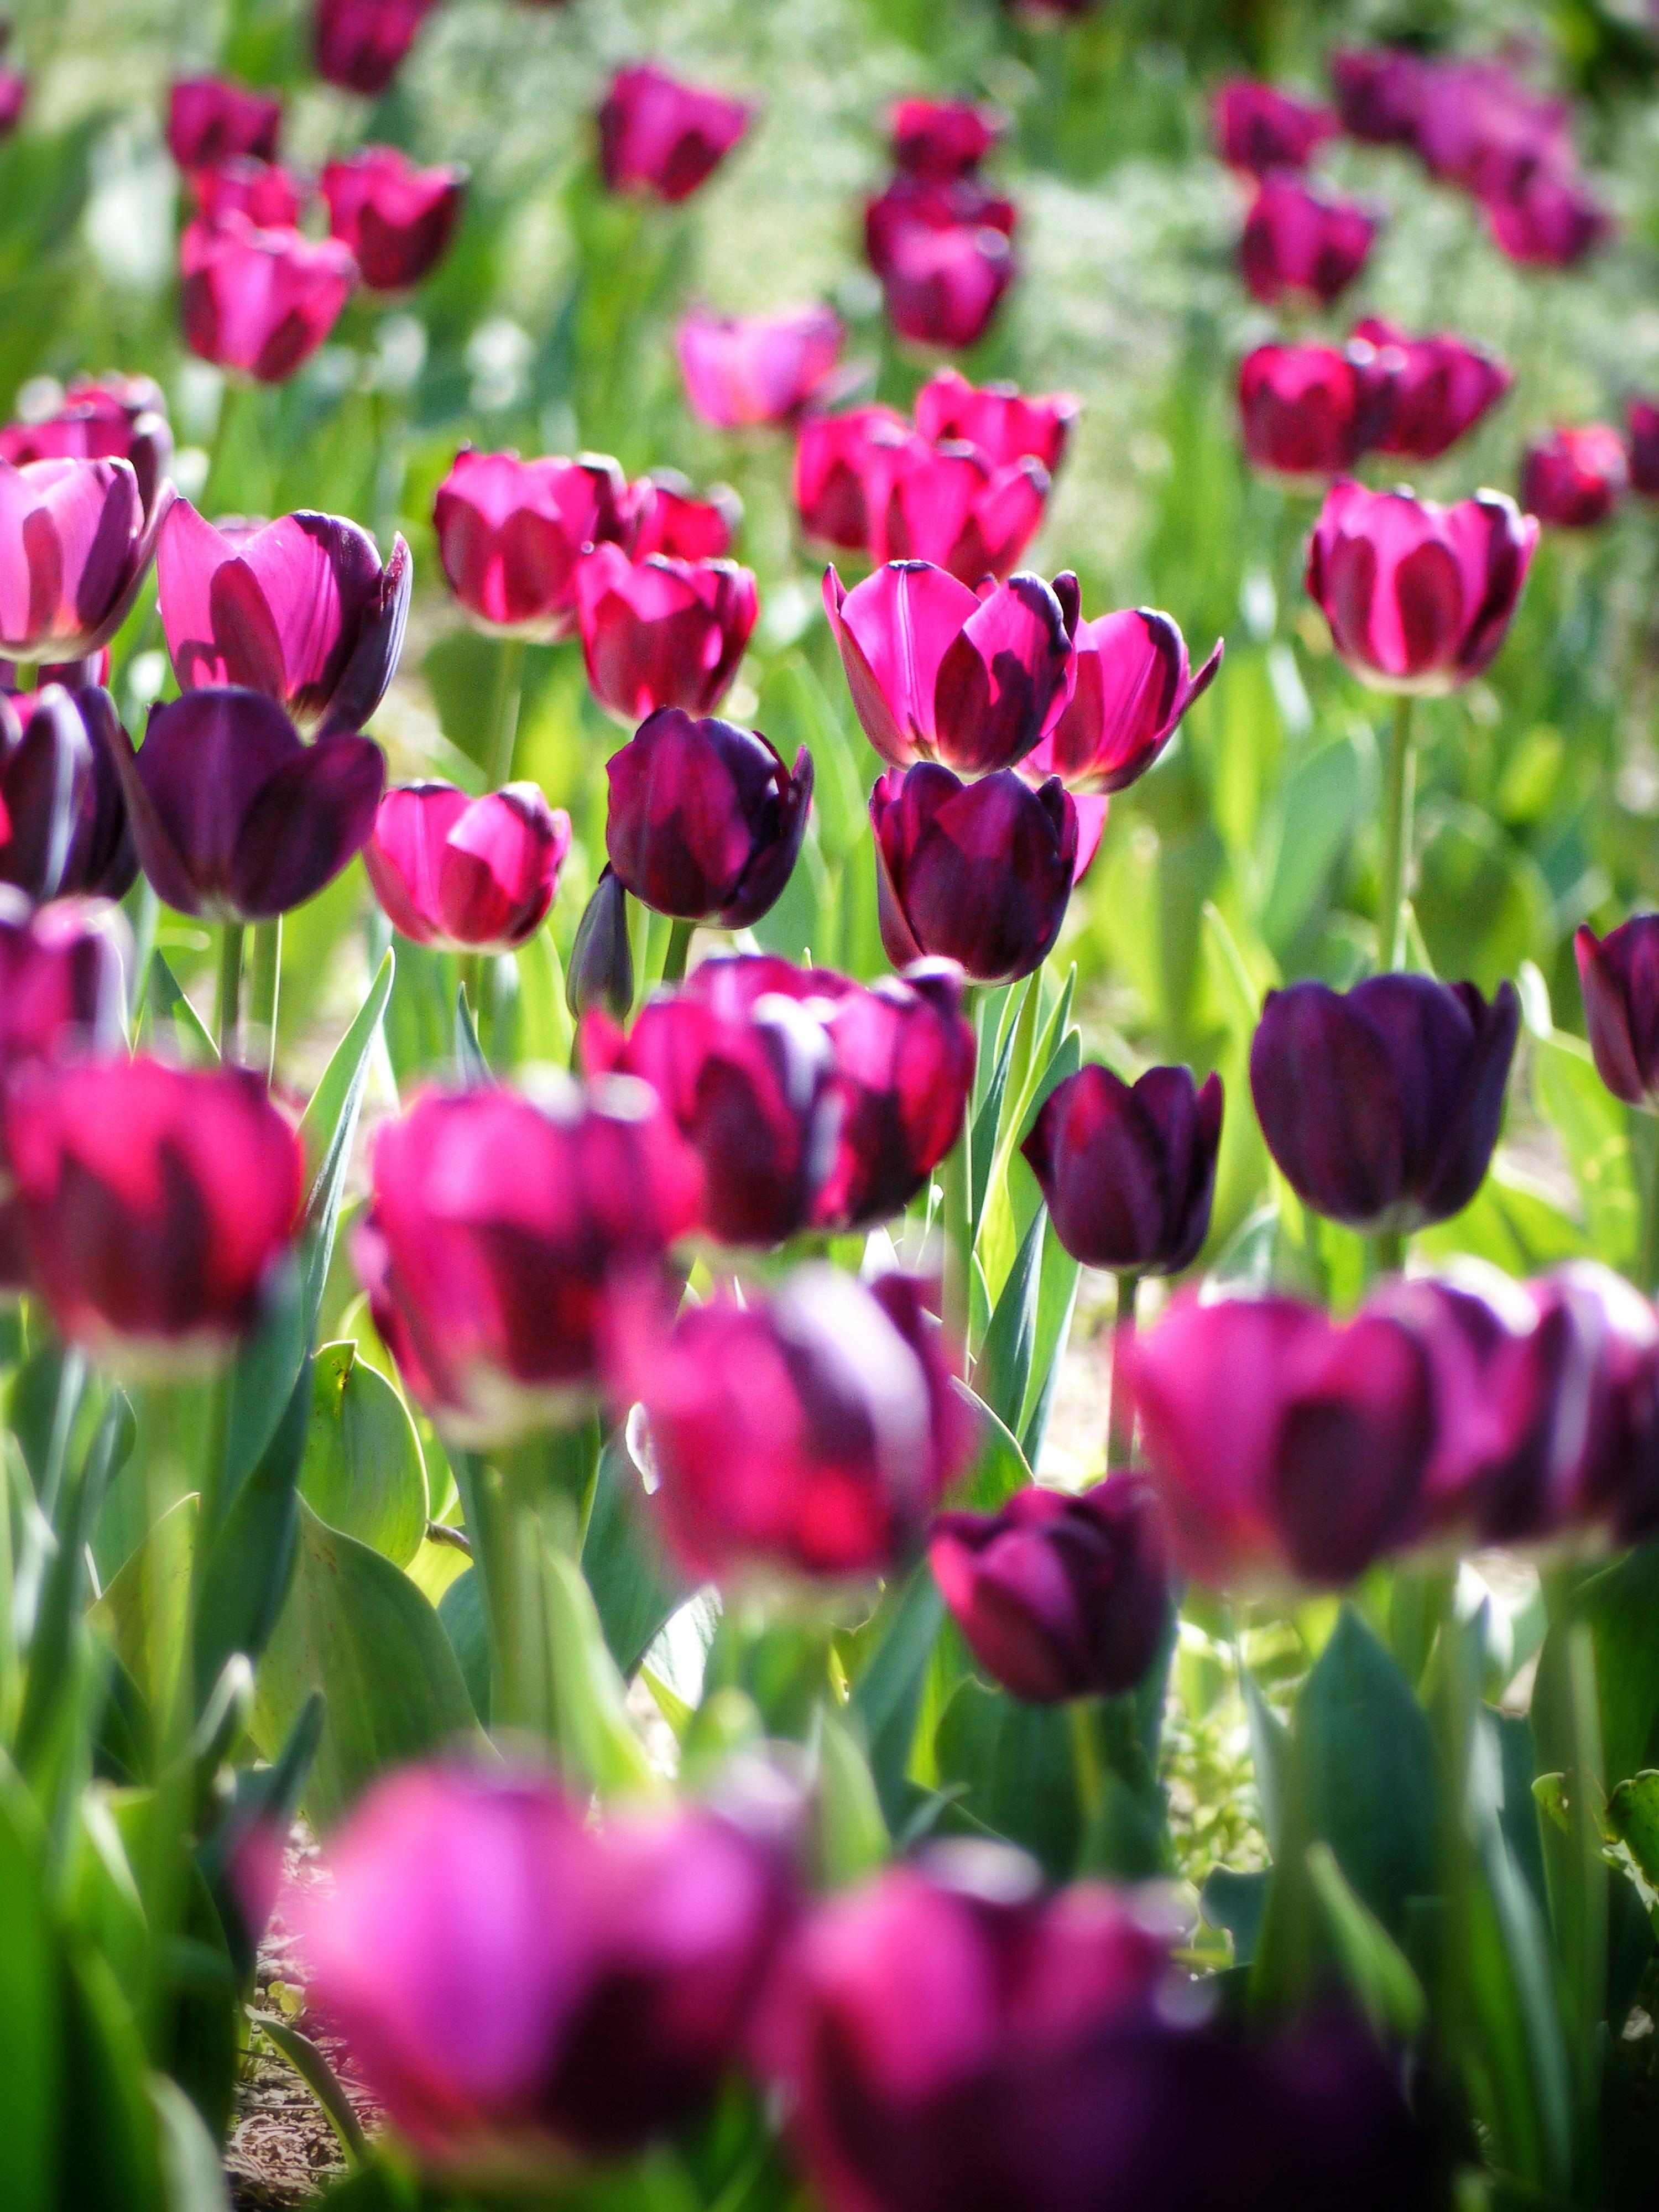 Pink Tulips Free Stock Photo